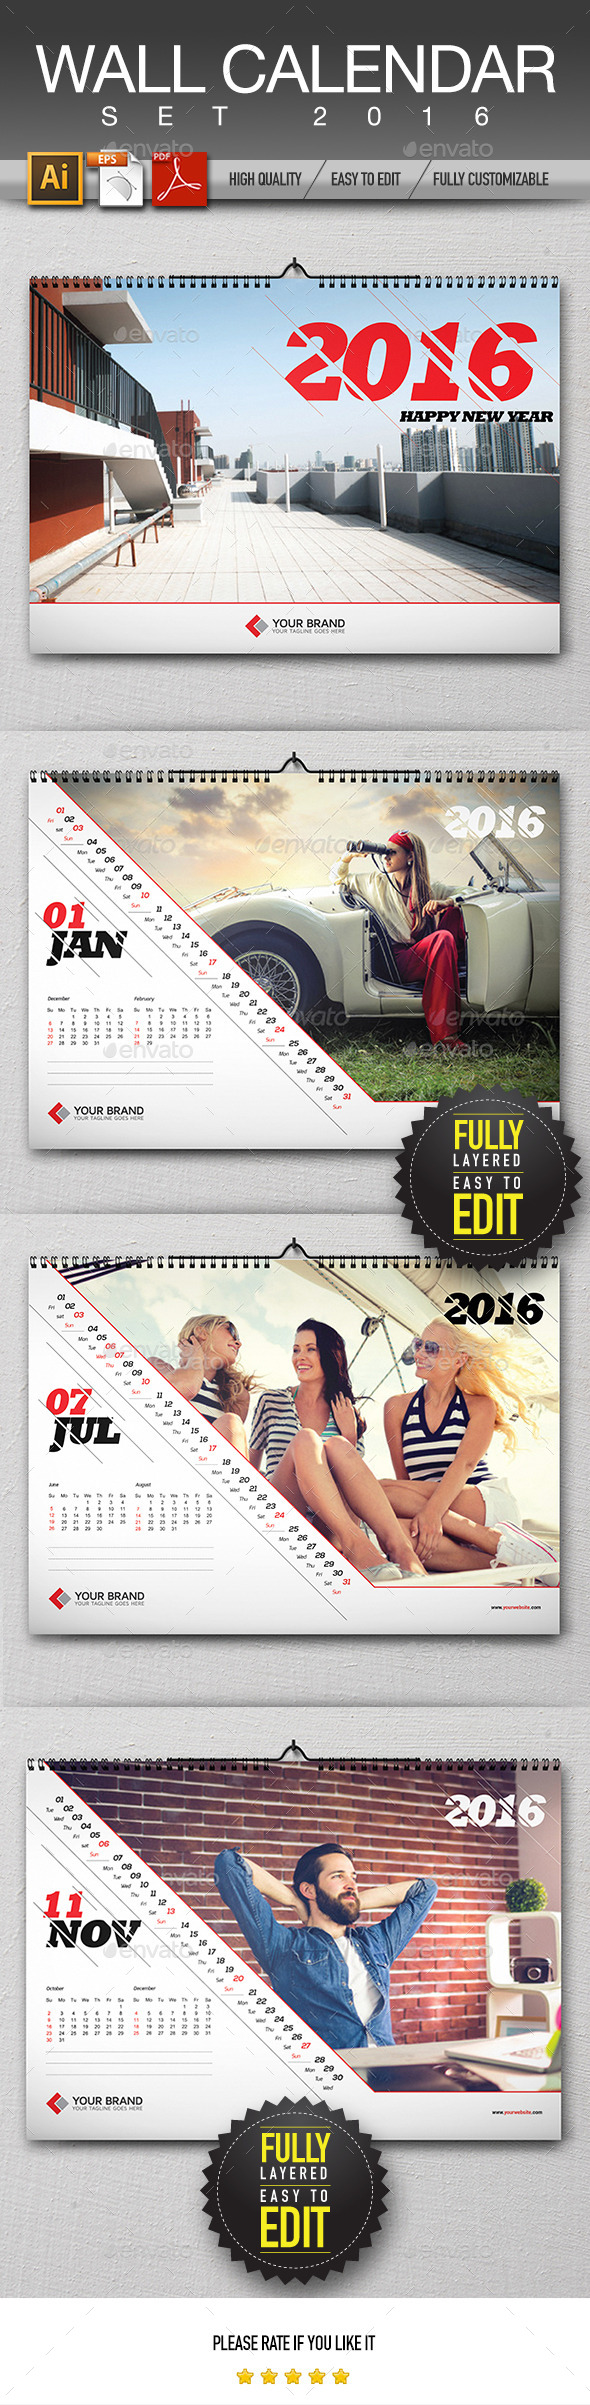 Wall Calendar Design 2016 - Calendars Stationery